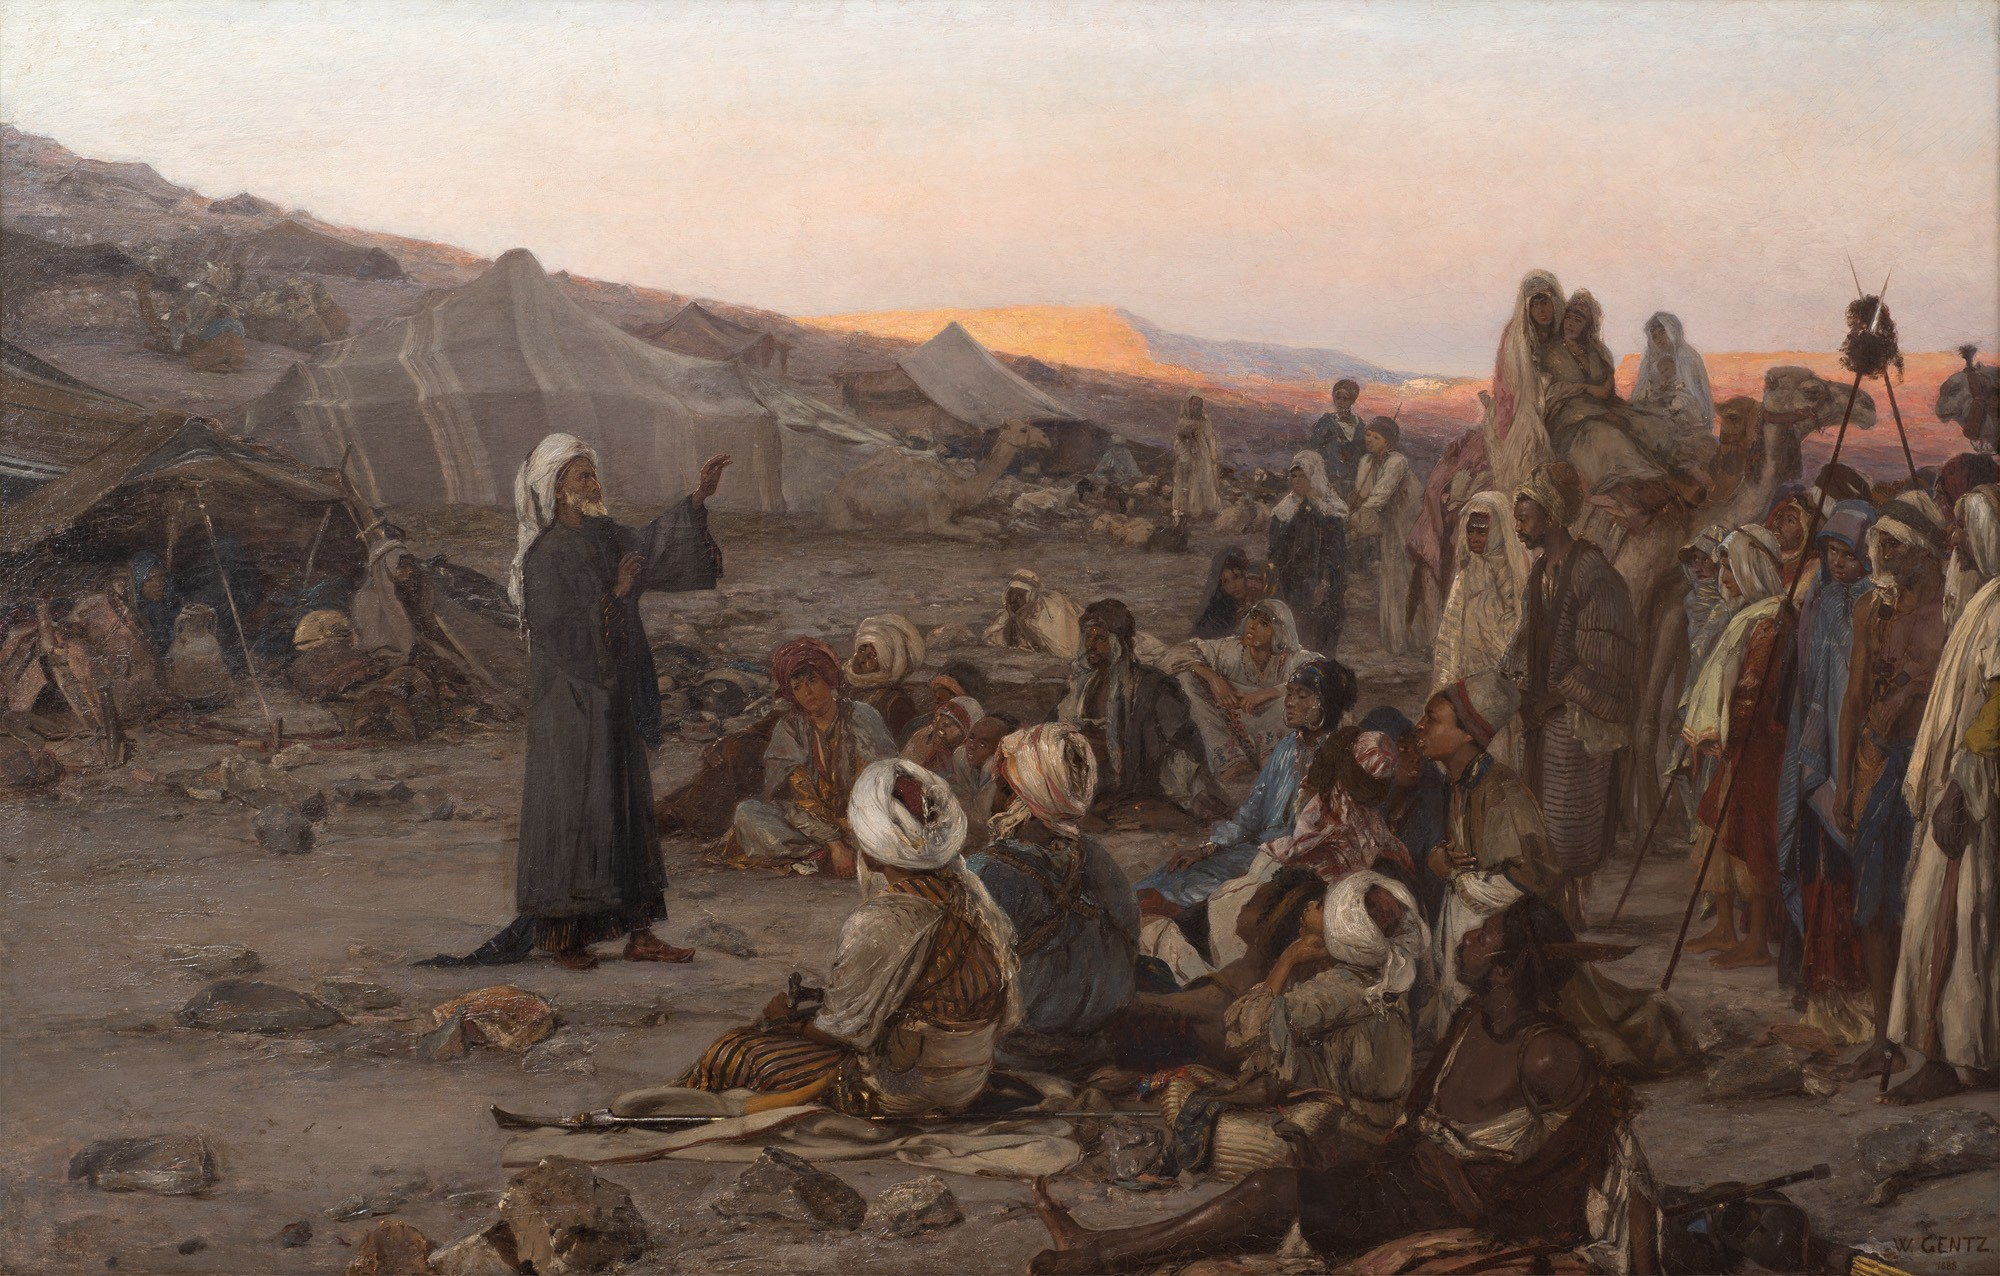 Wilhelm Gentz: Prayer in the desert, oil painting, 1888 (Private loan to the Museum Neuruppin, Photo: Ronka Oberhammer / Lorenz Kienzle)